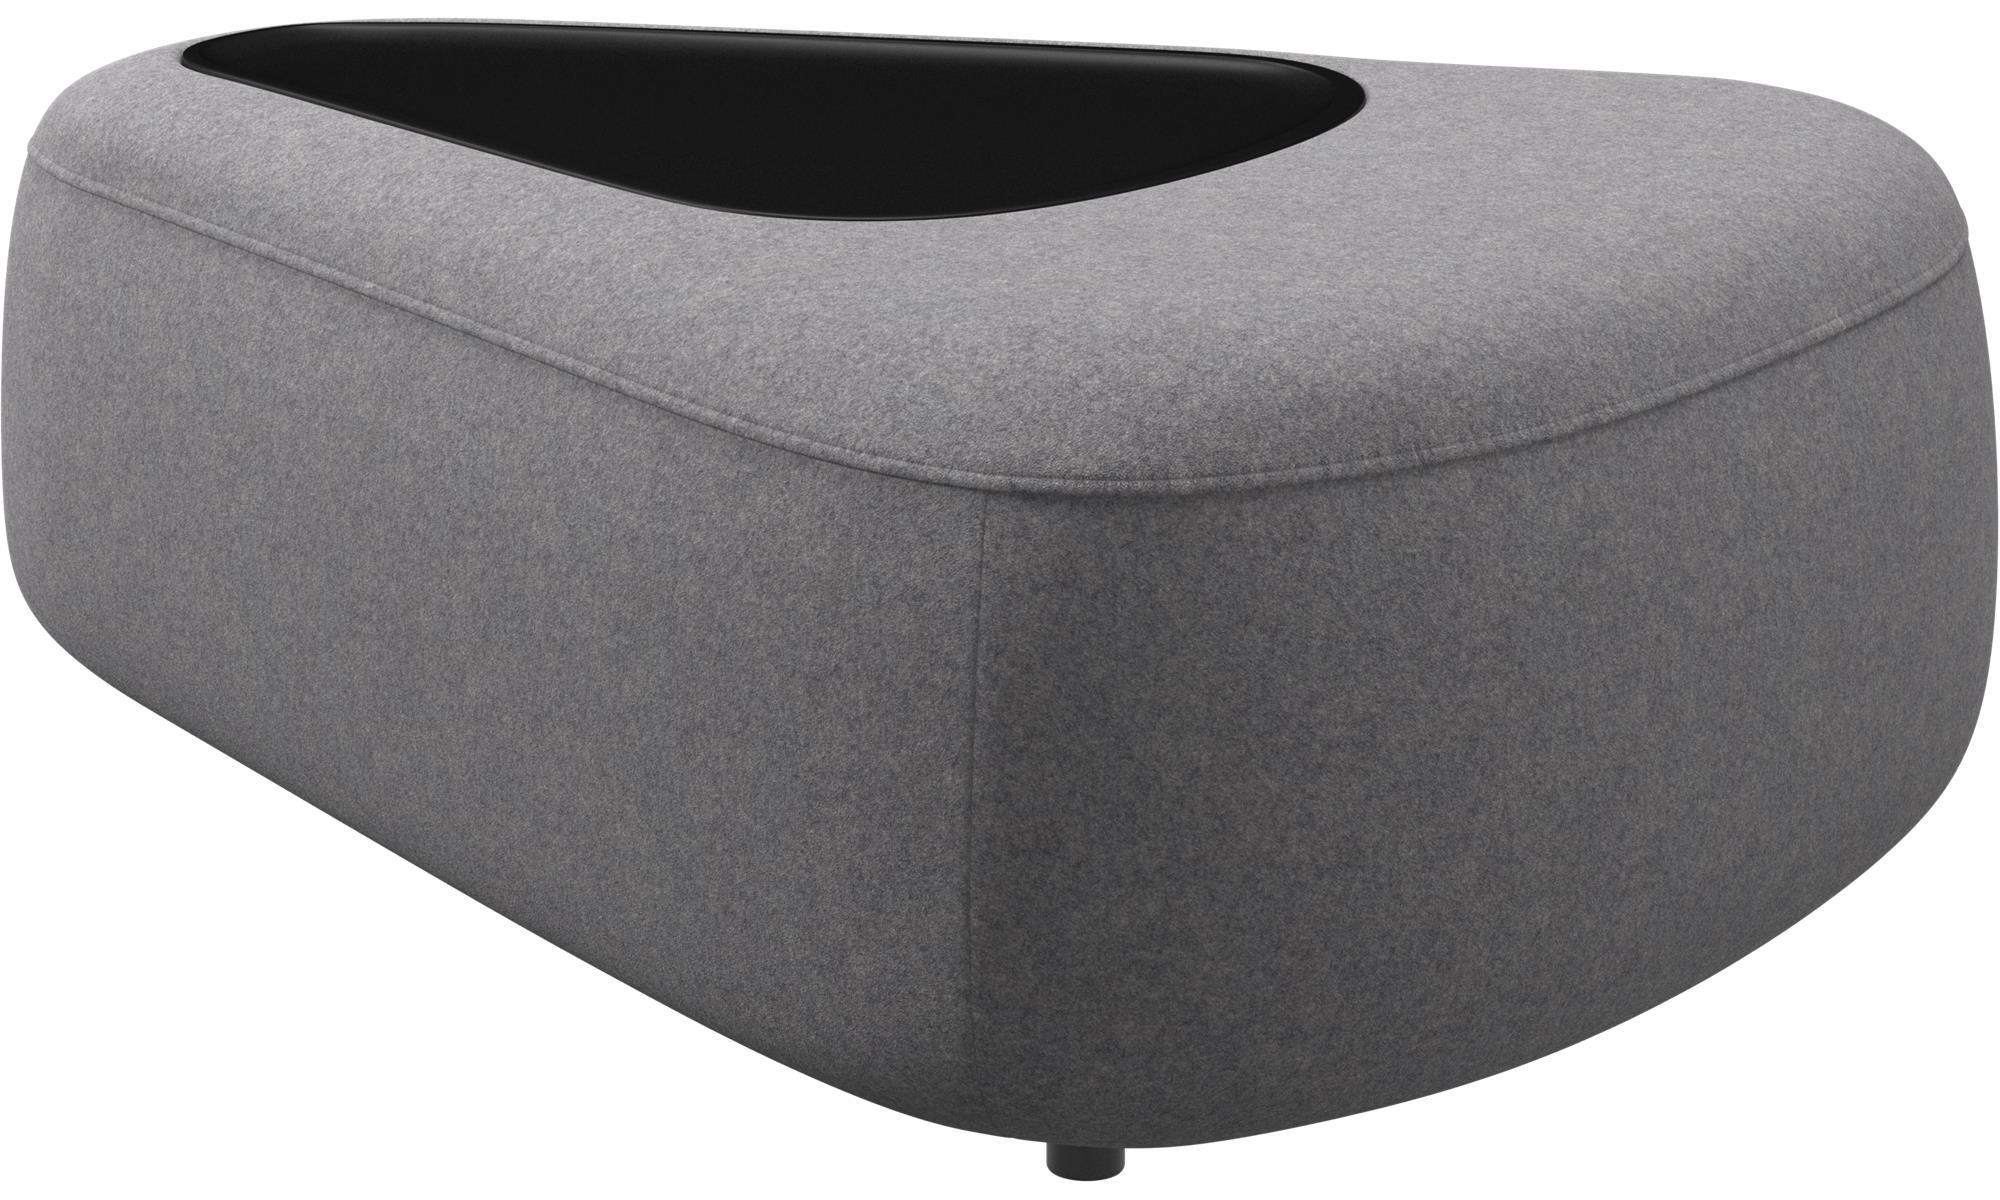 modular sofas ottawa triangular pouf with tray matt black structure boconcept. Black Bedroom Furniture Sets. Home Design Ideas